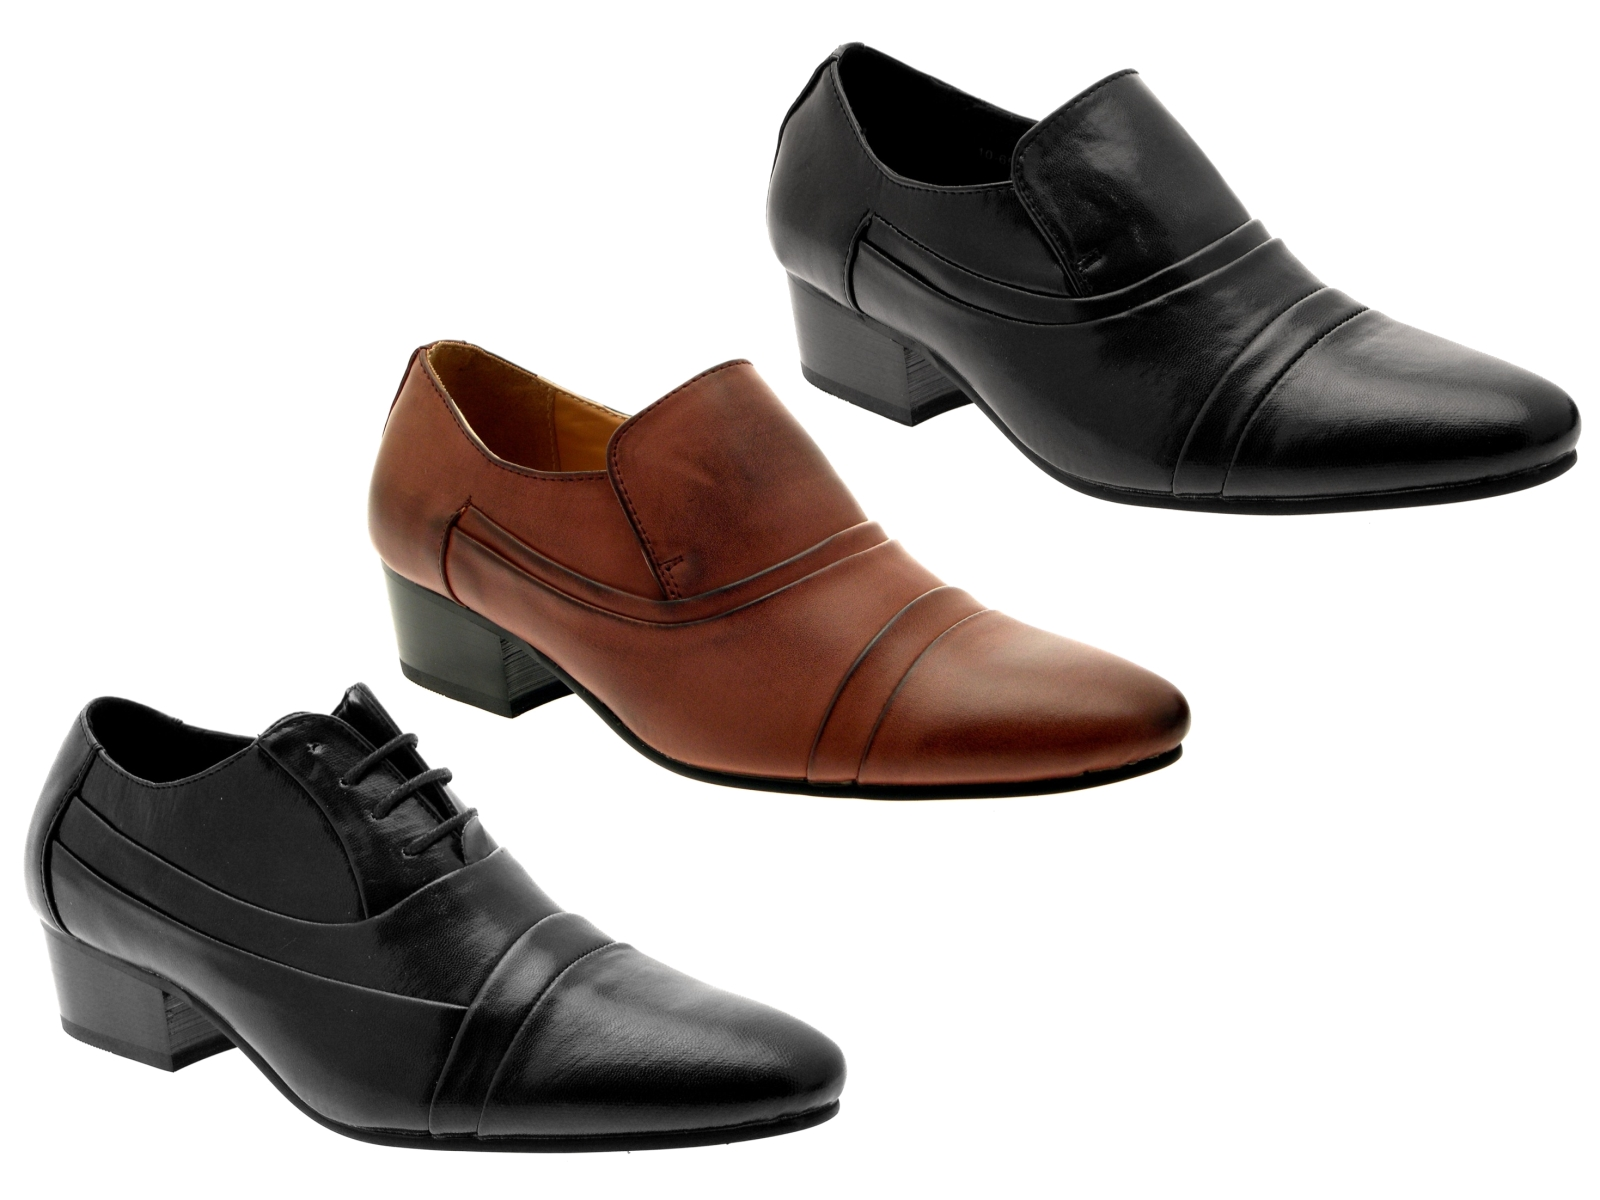 Mens Smart Cuban Heels Formal Wedding Office Shoes